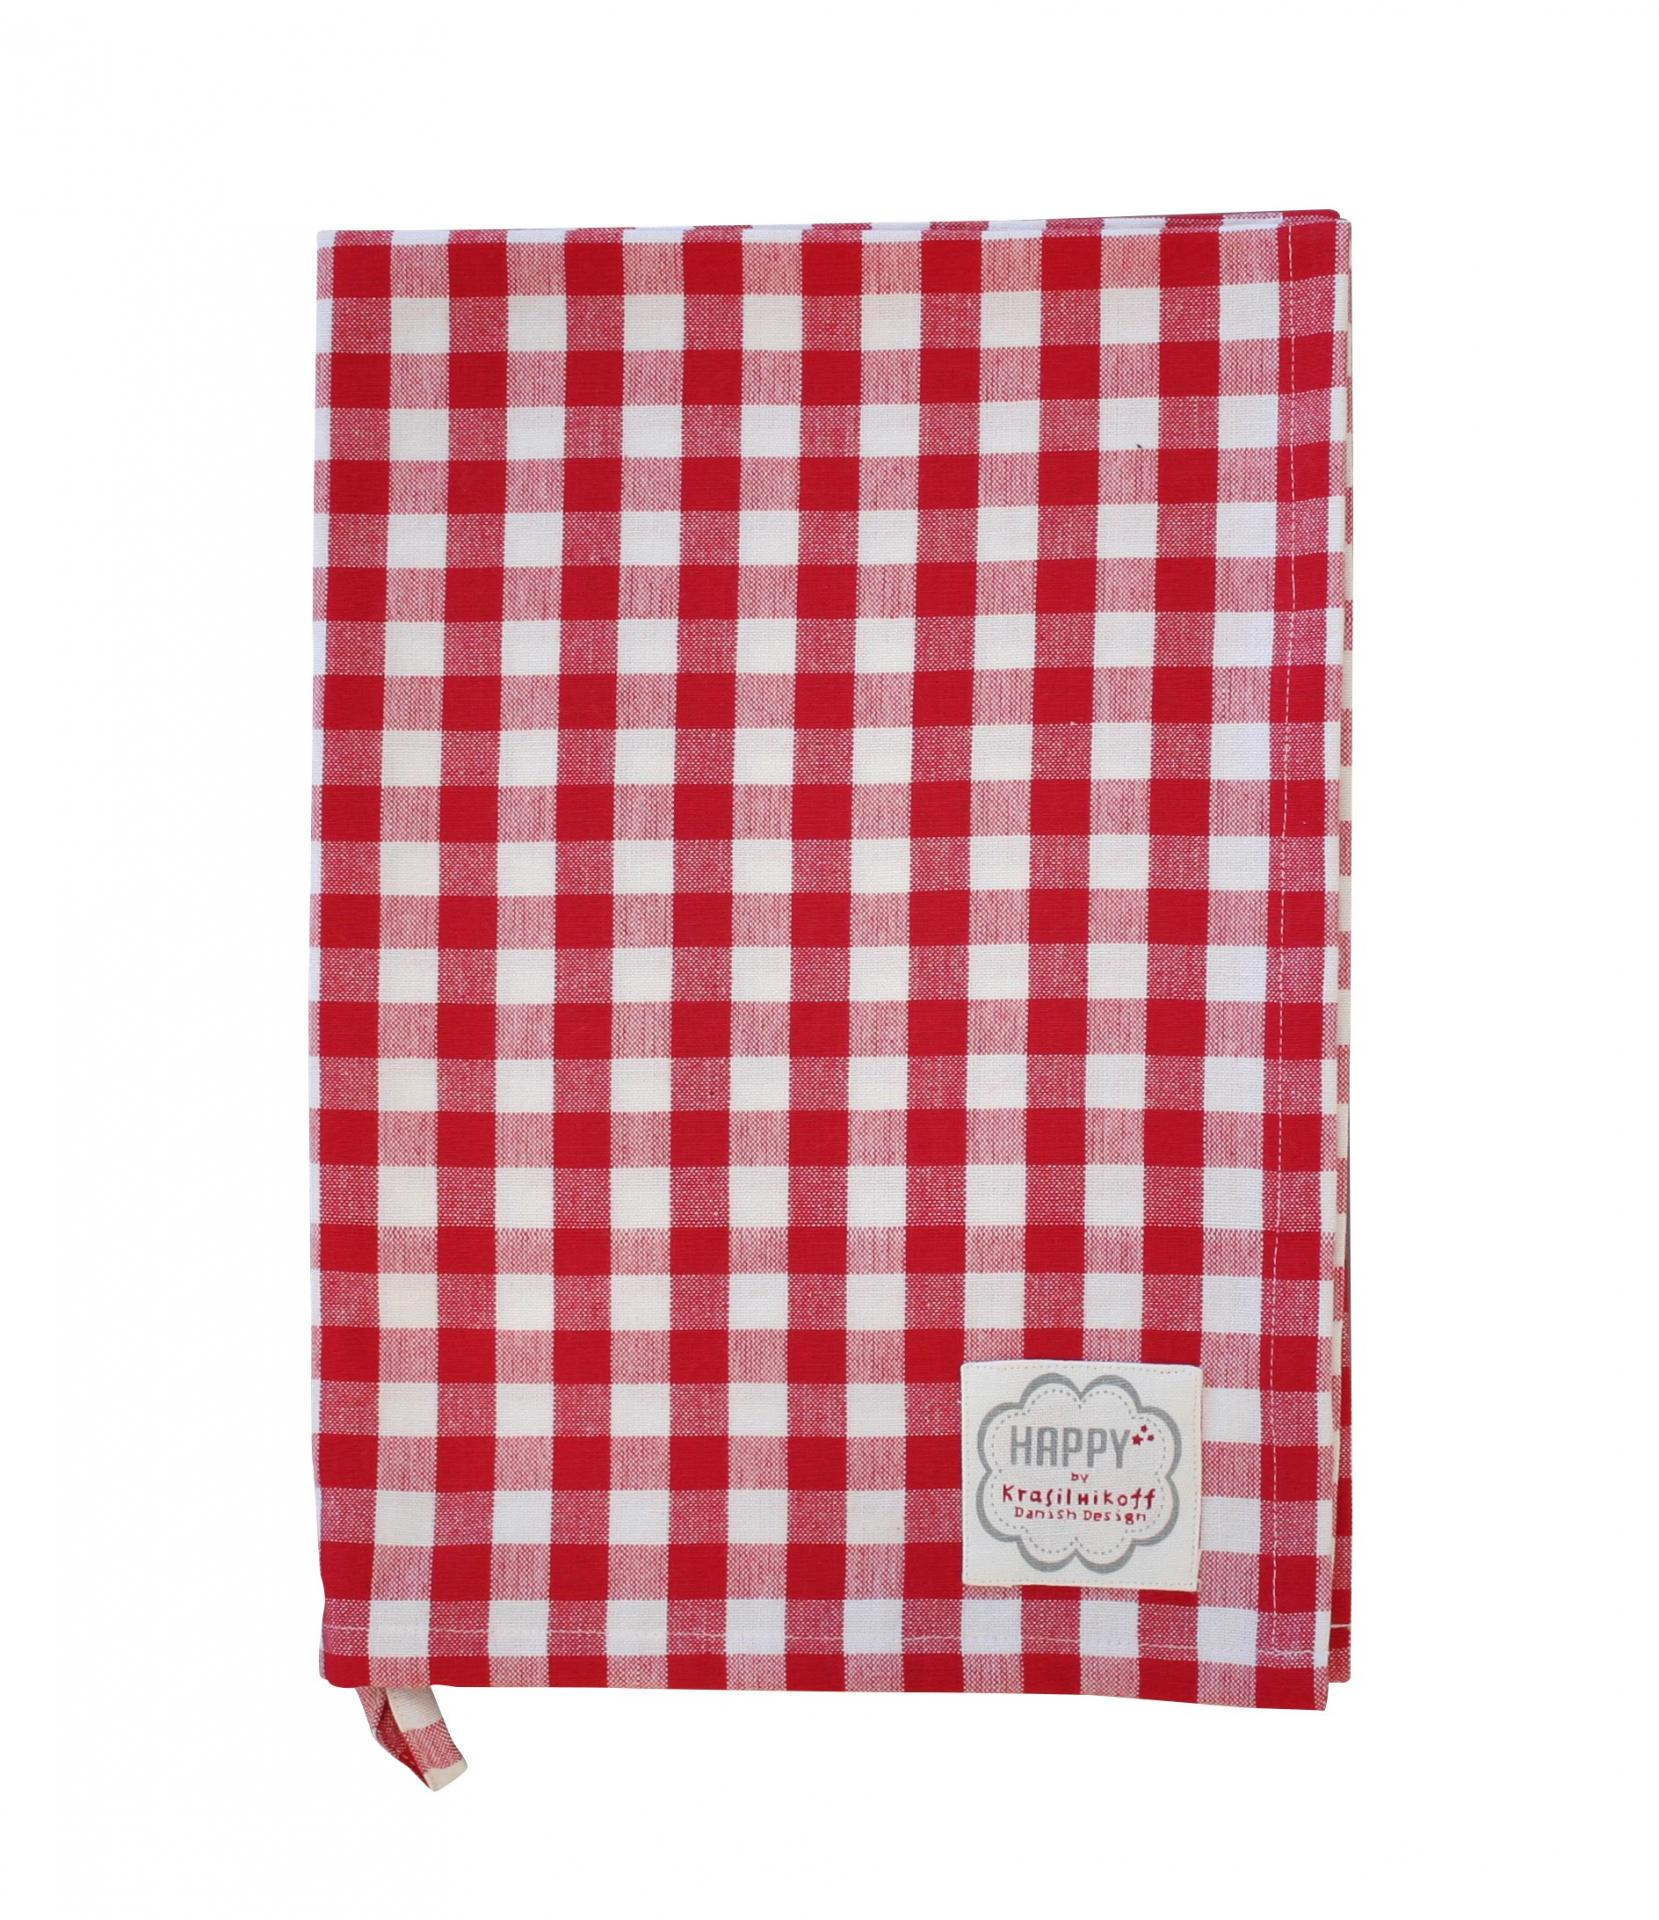 Krasilnikoff Utěrka Red checker, červená barva, textil